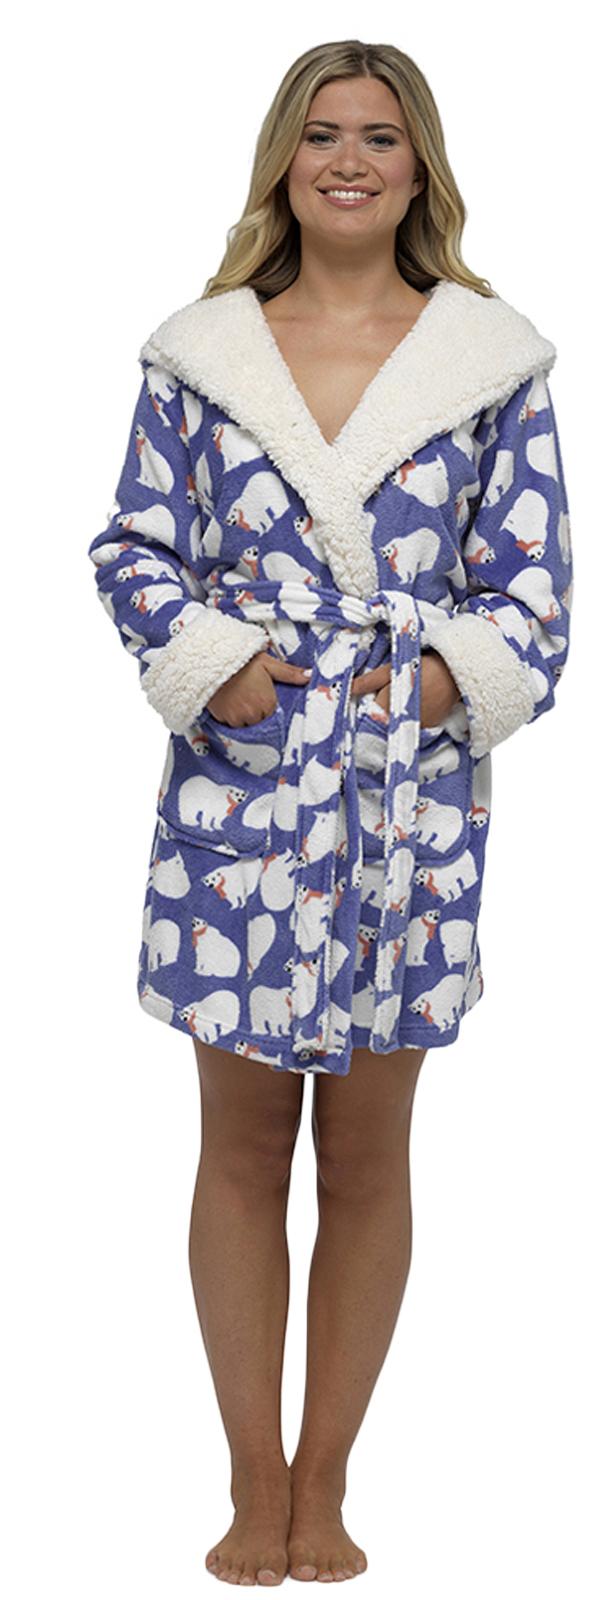 4efa77cfc6 Womens Short Hooded Dressing Gown Bath Robe Housecoat + Belt Ladies ...